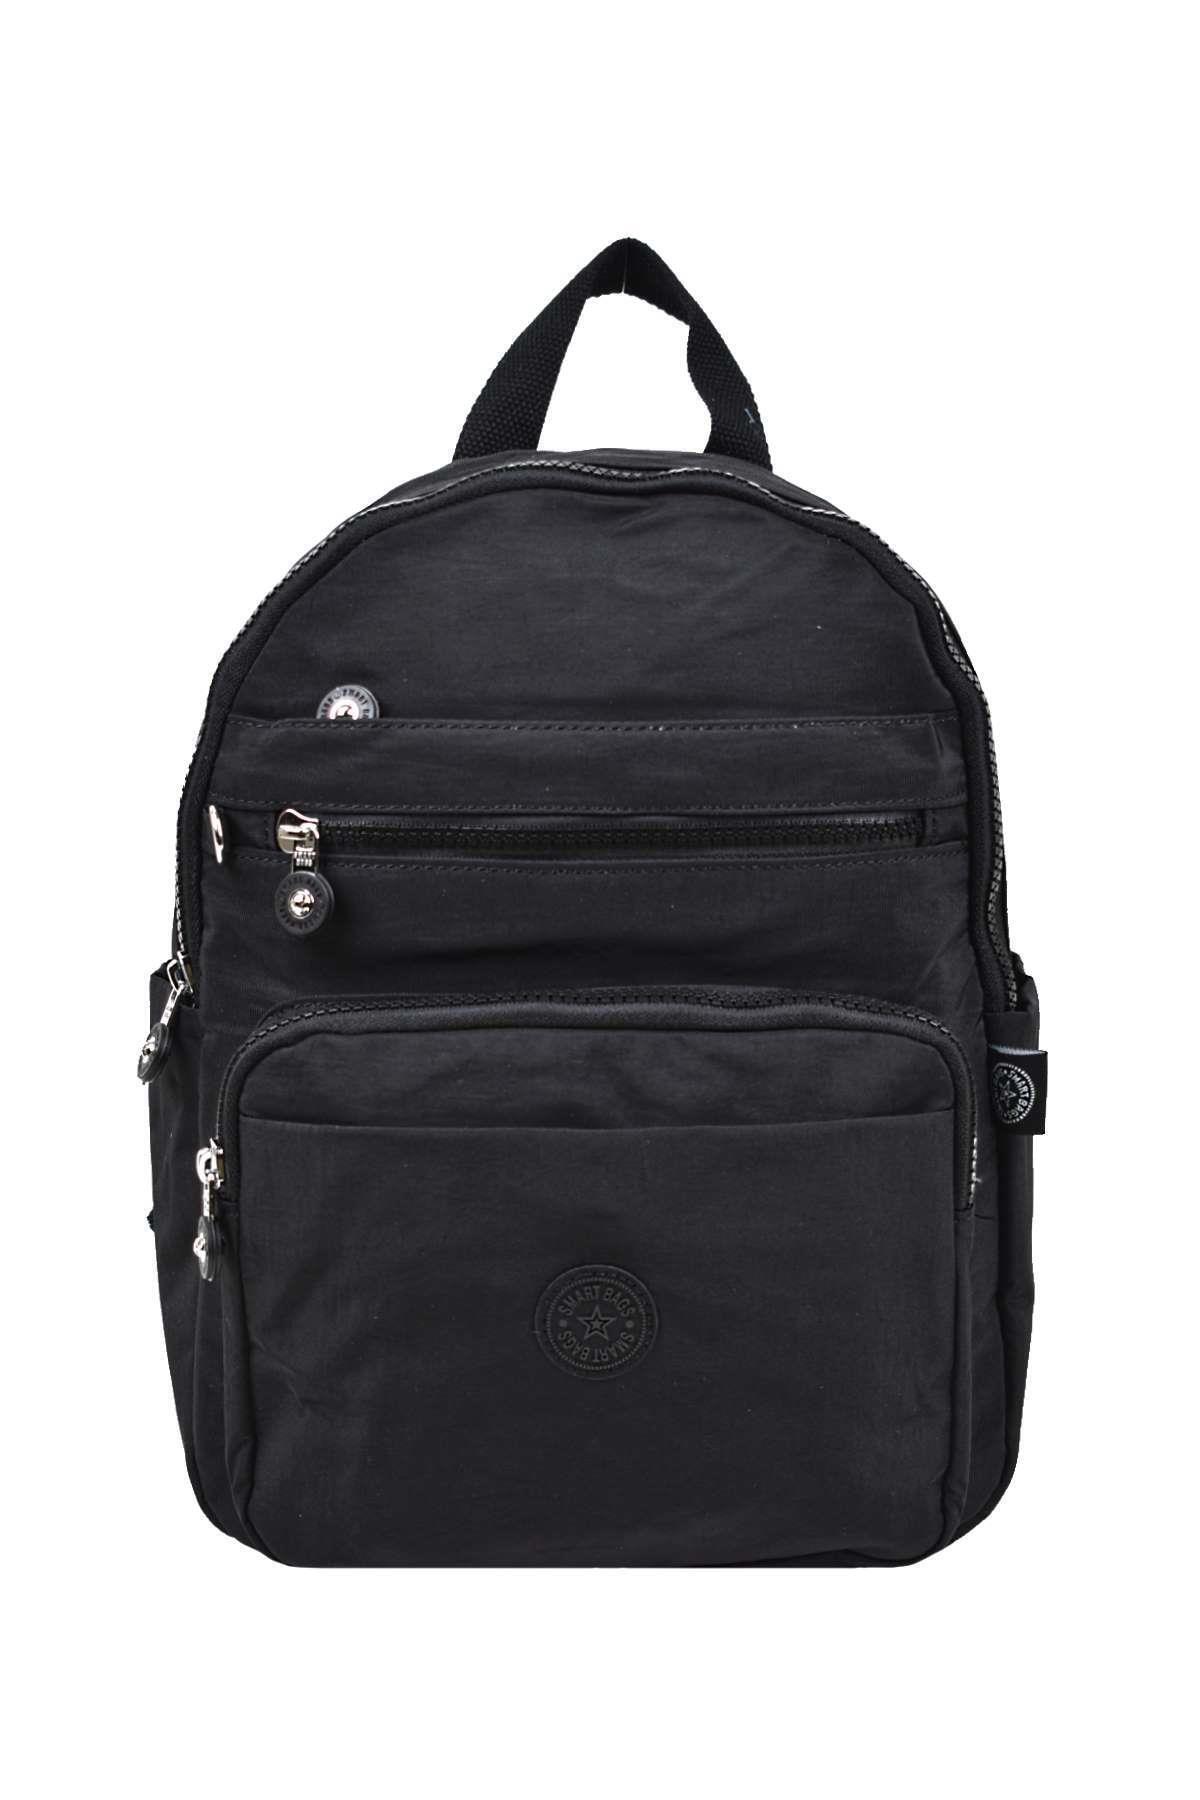 SMART BAGS Sırt Çantası Siyah 3060 1